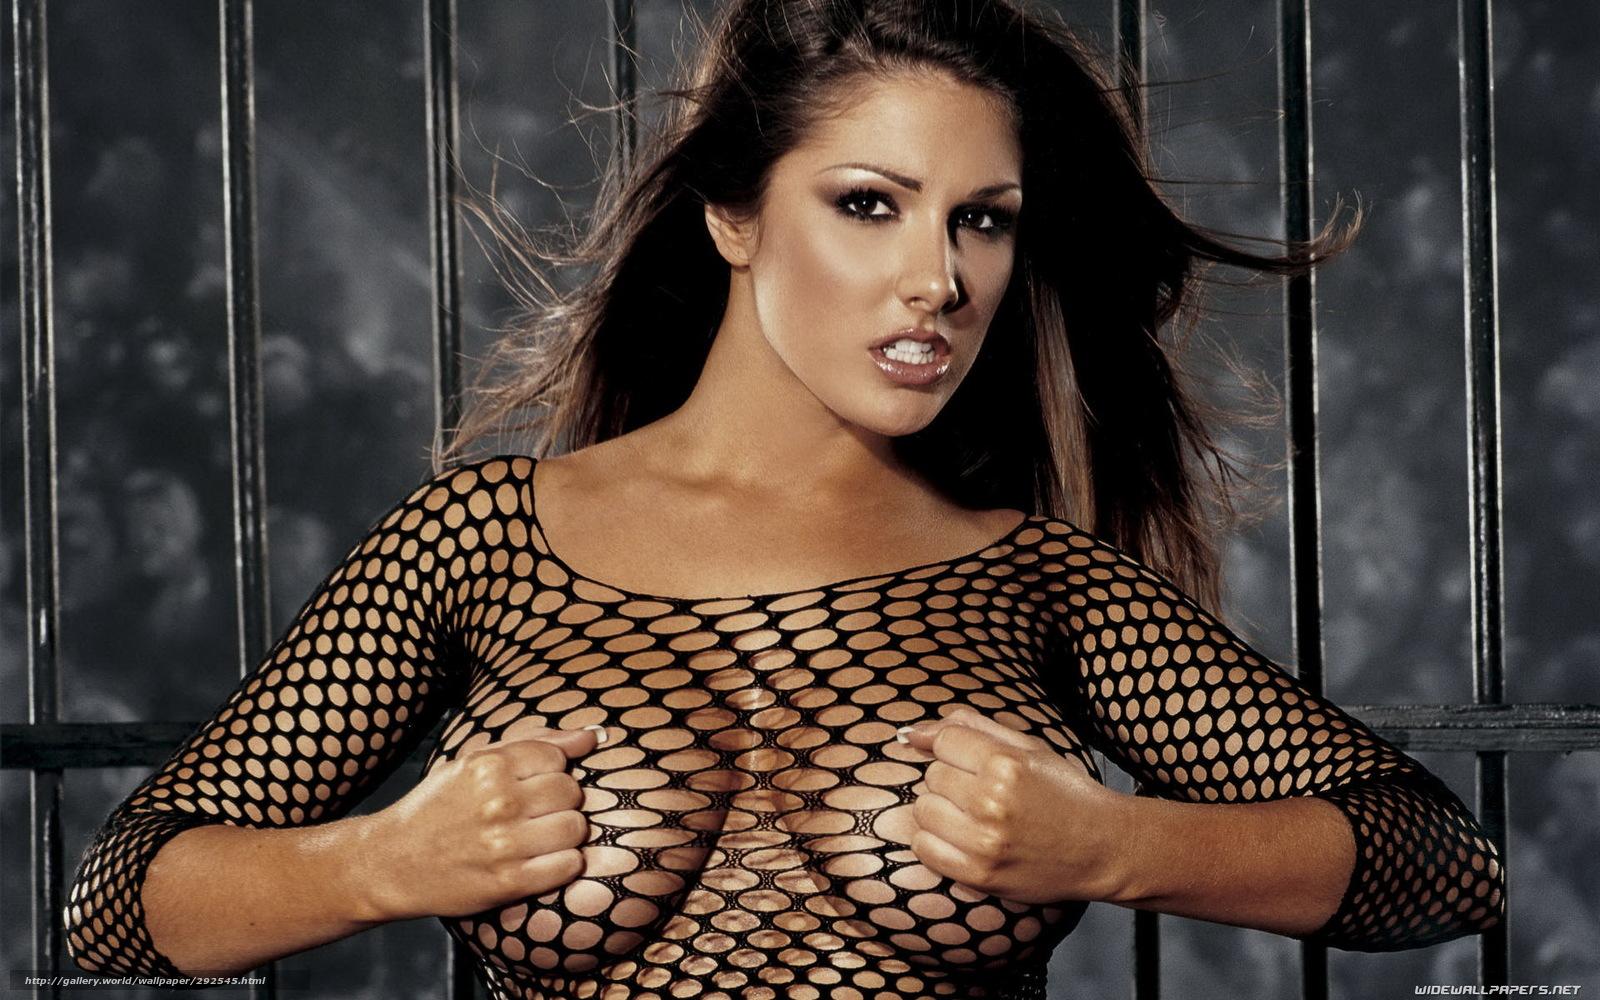 Sexynudi girlwallpaper sex gallery